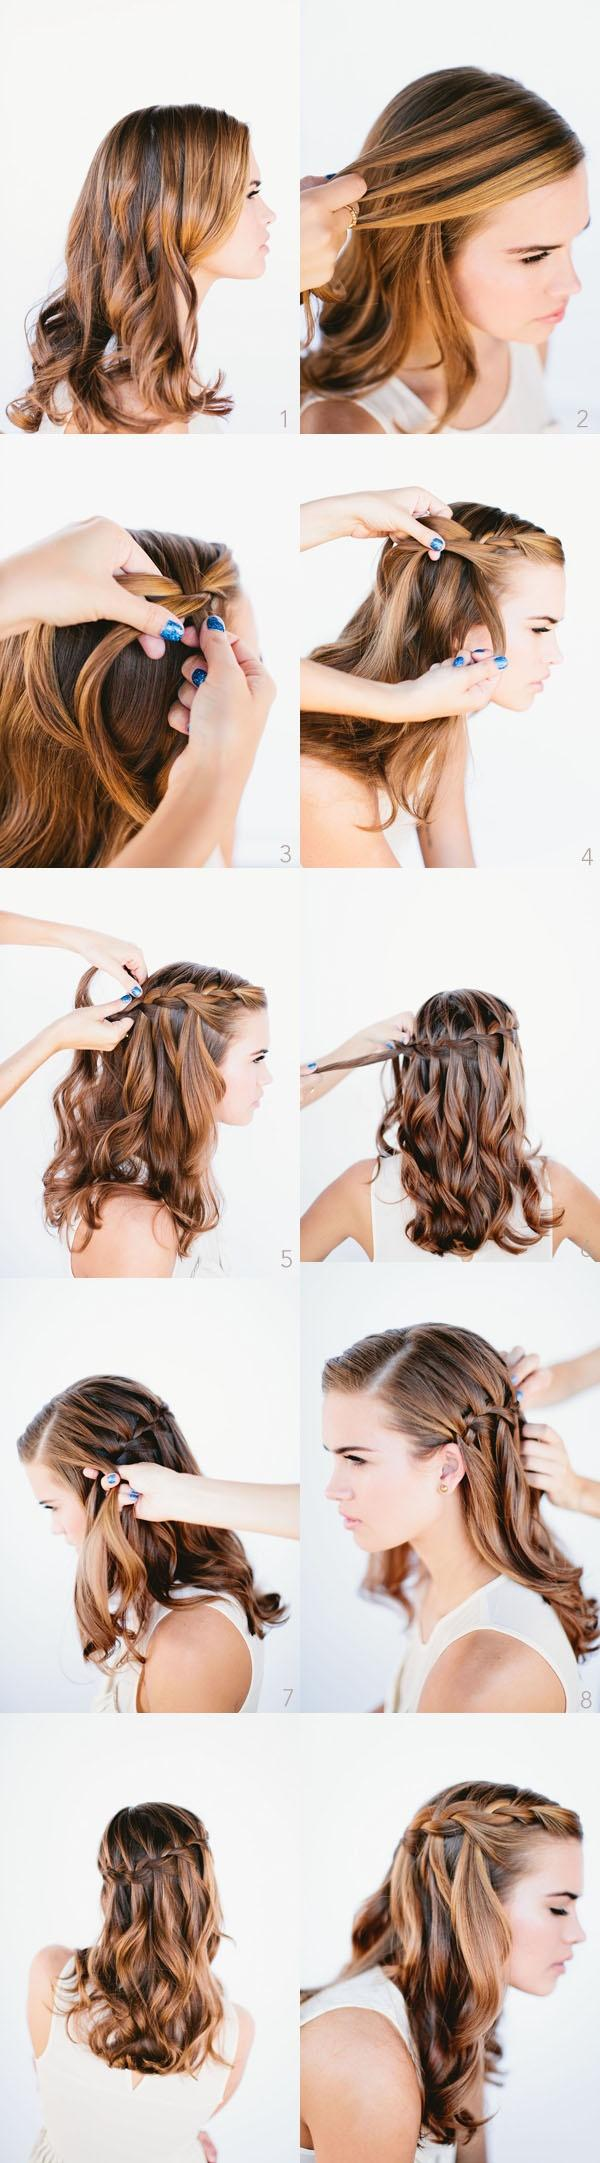 Create Your Heavens Online At Www Heavensonline Com Braided Hairstyles For Wedding Long Hair Tutorial Waterfall Braid Hairstyle